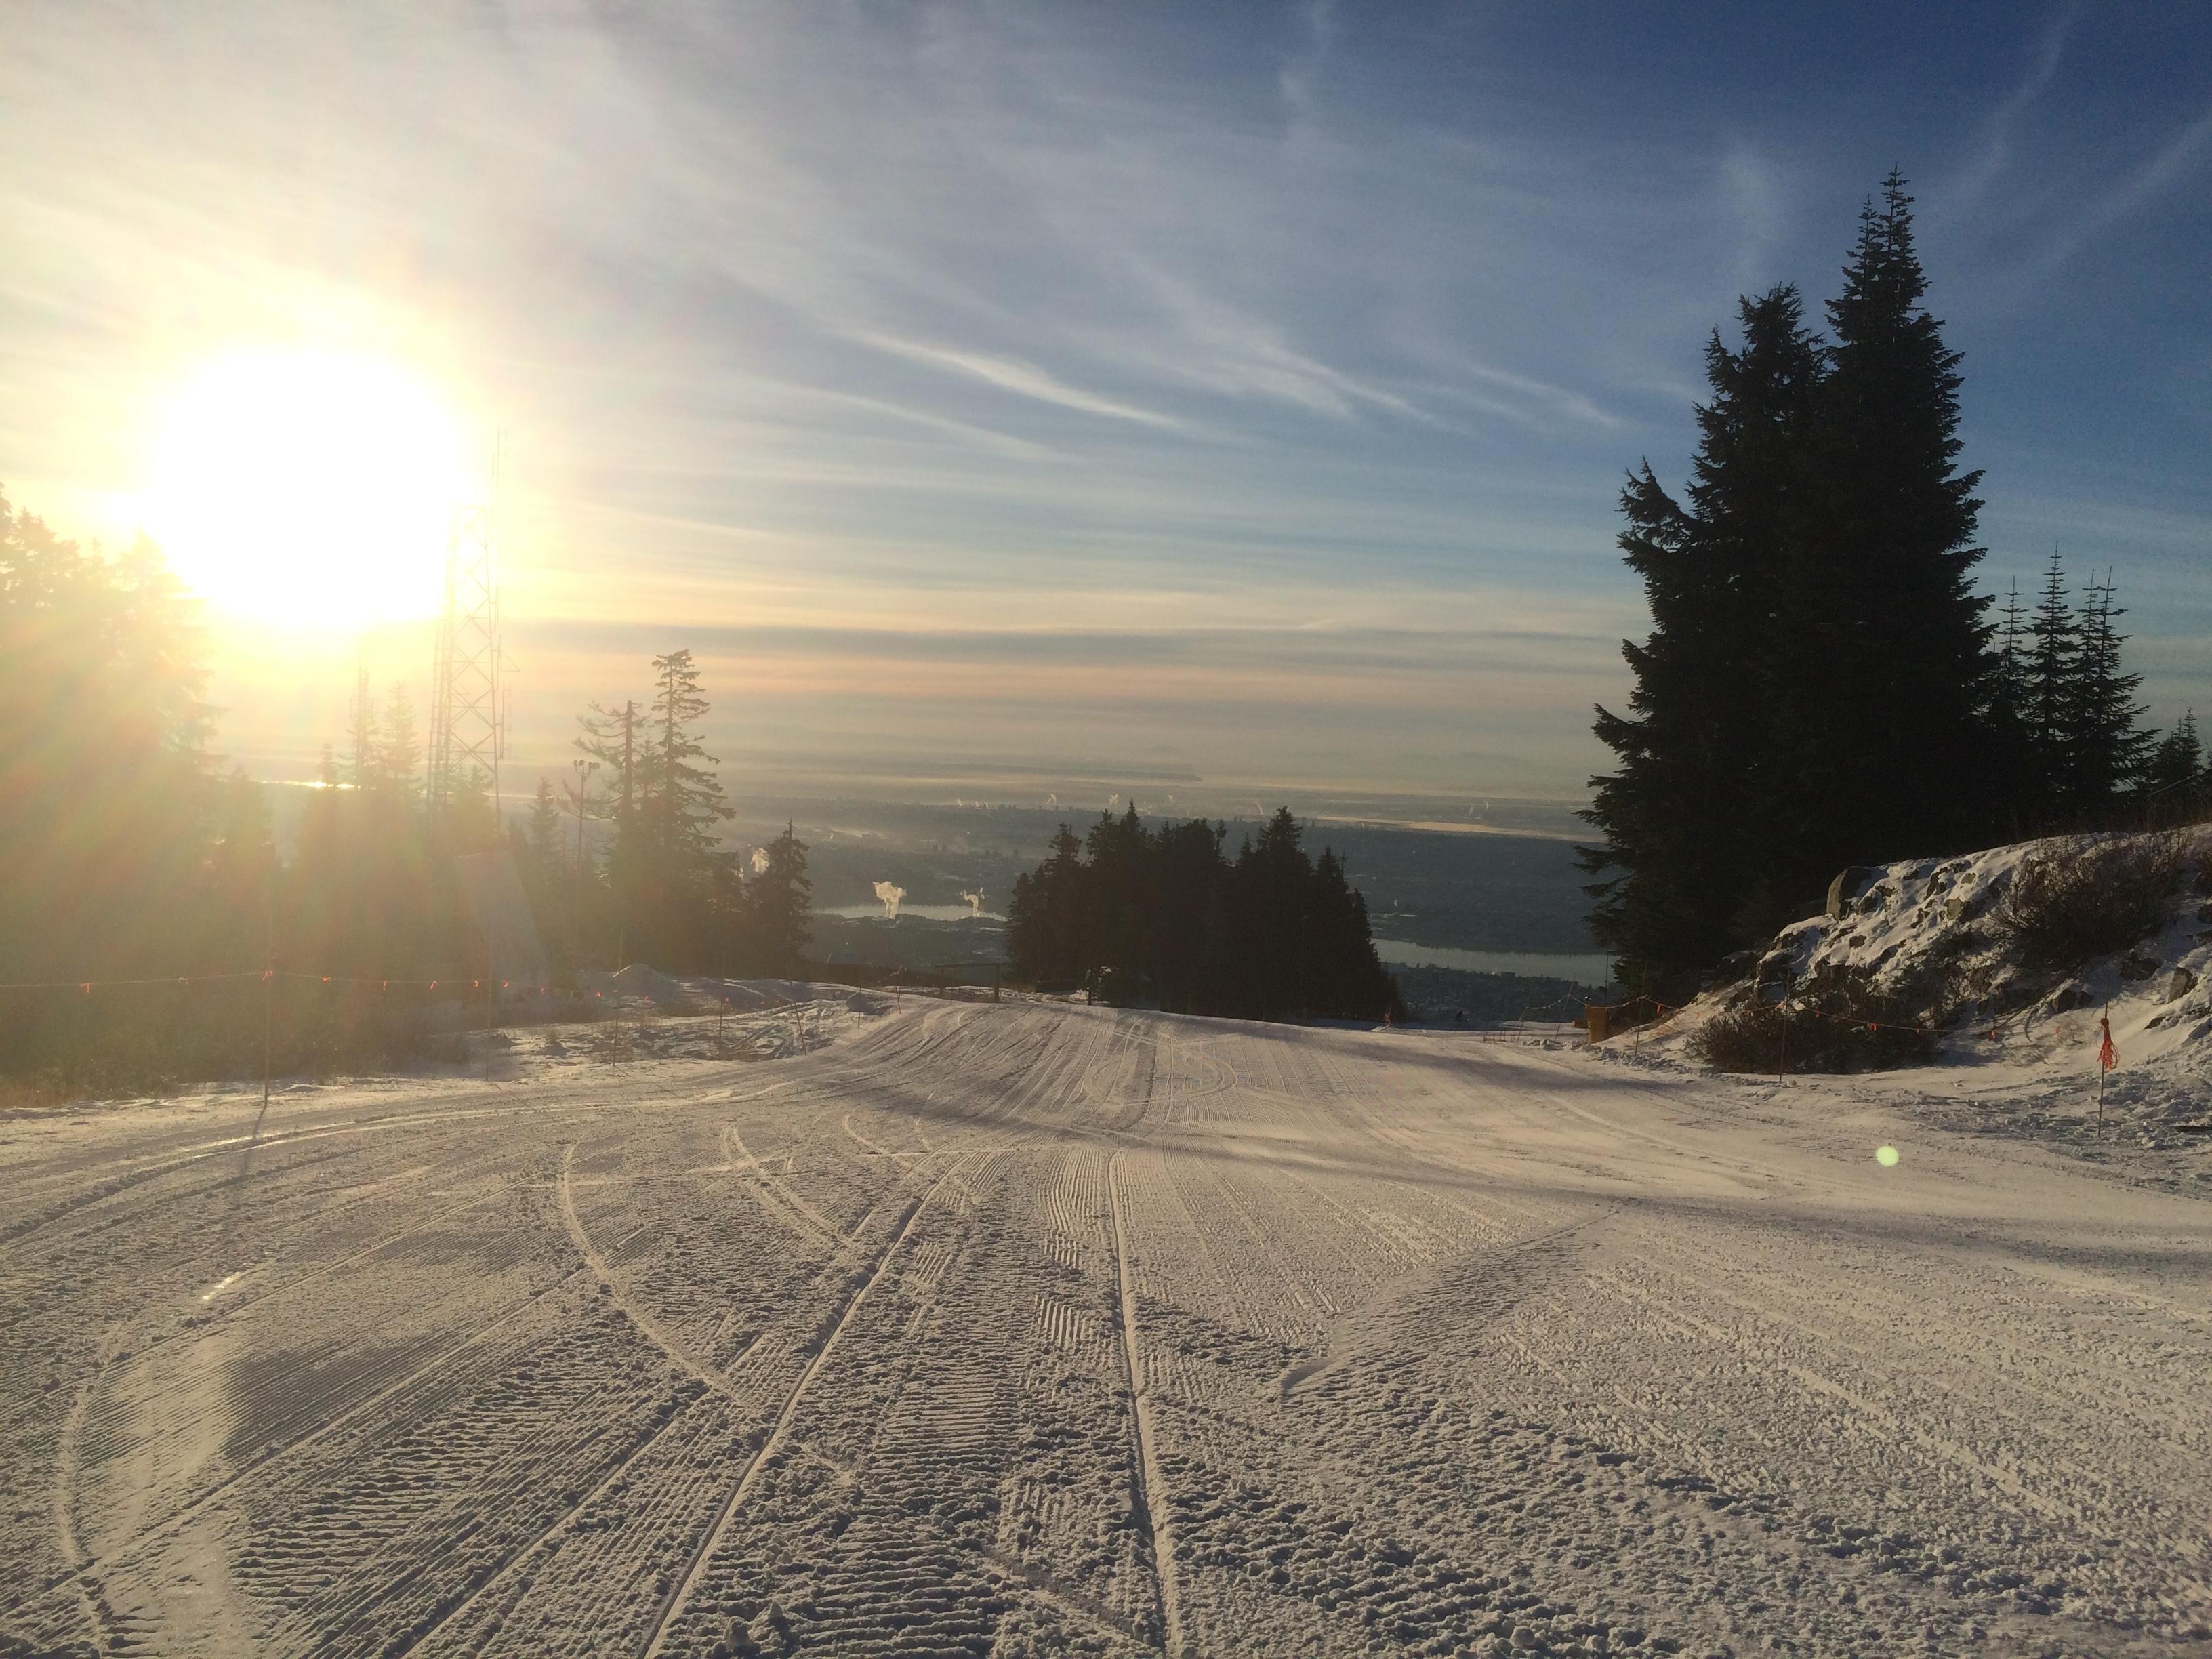 December 3, 2014, Grouse Mountain